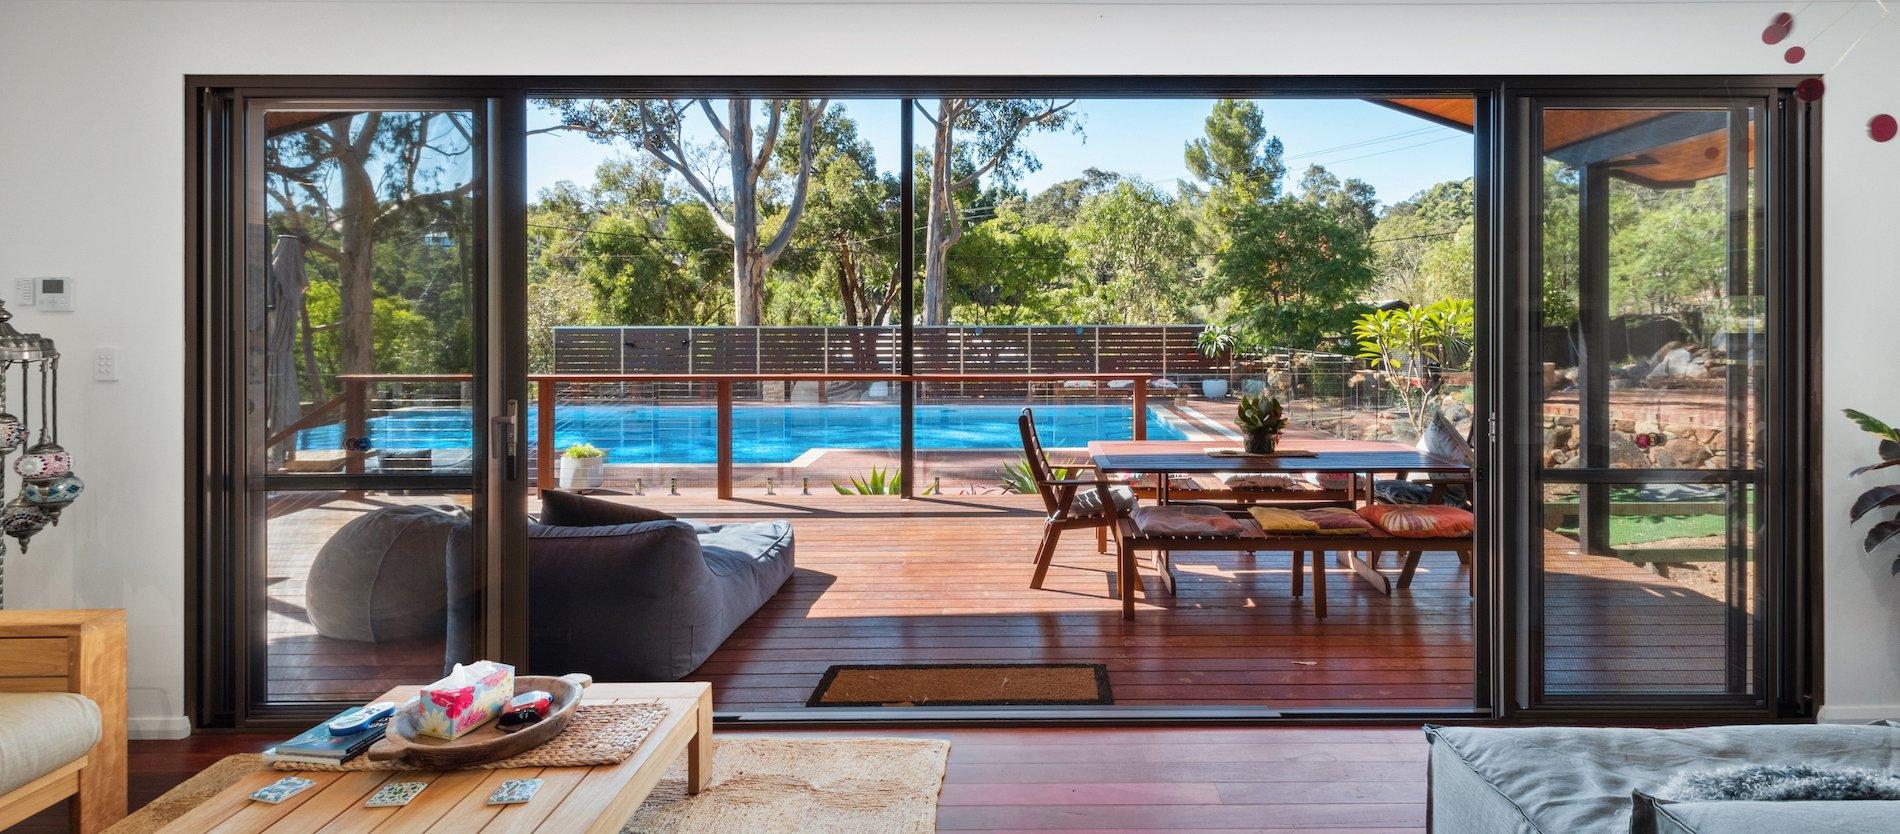 inside-to-pool-view-balustrade-landscape